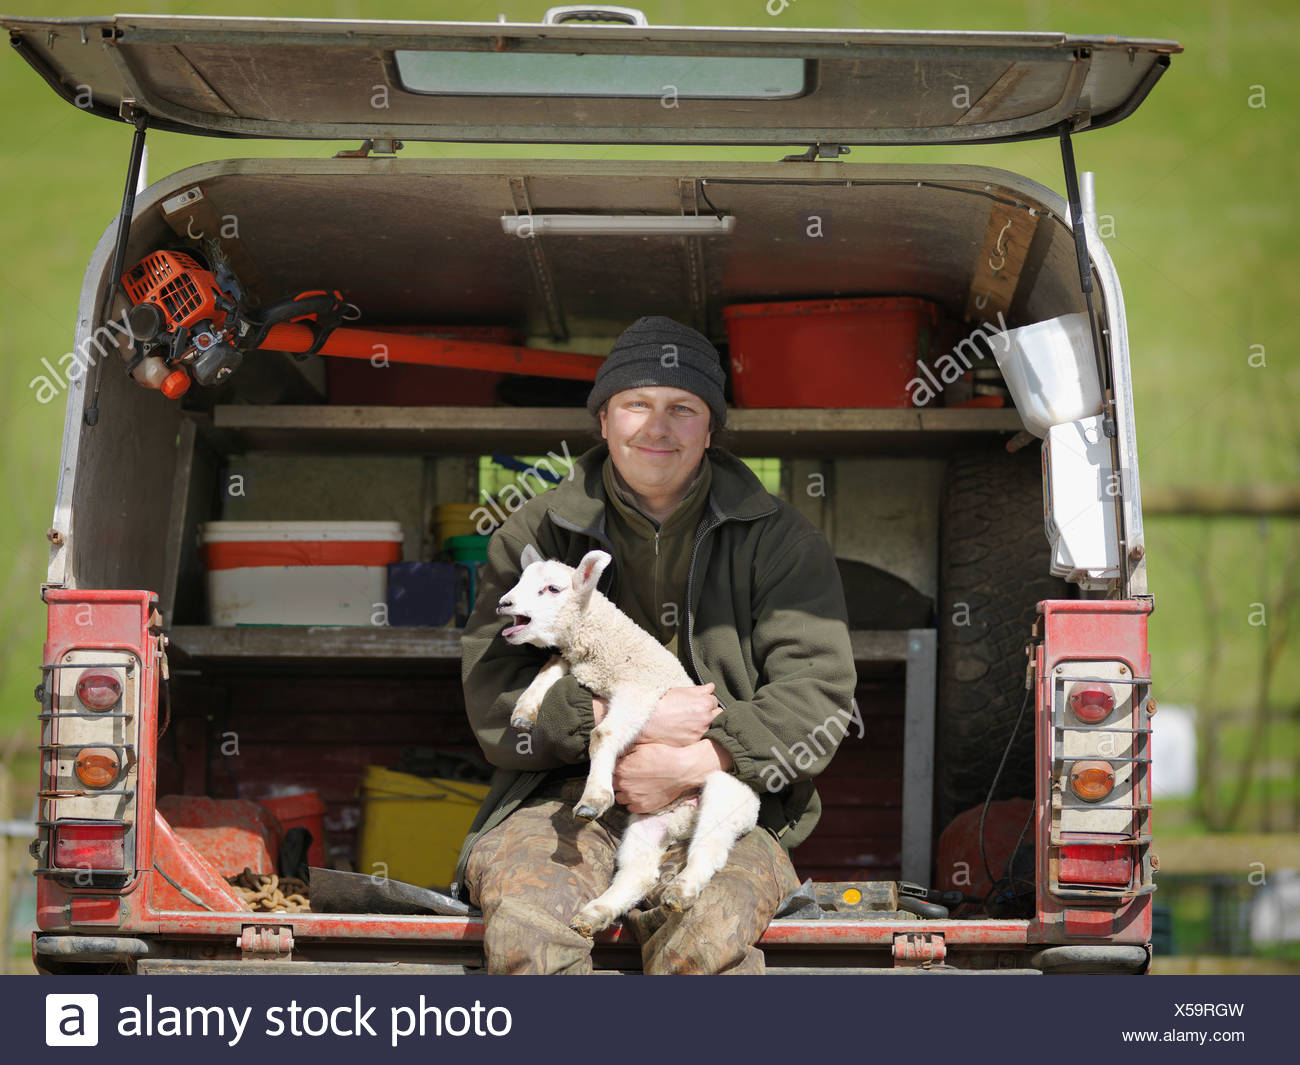 Man sitting in van boot holding lamb - Stock Image